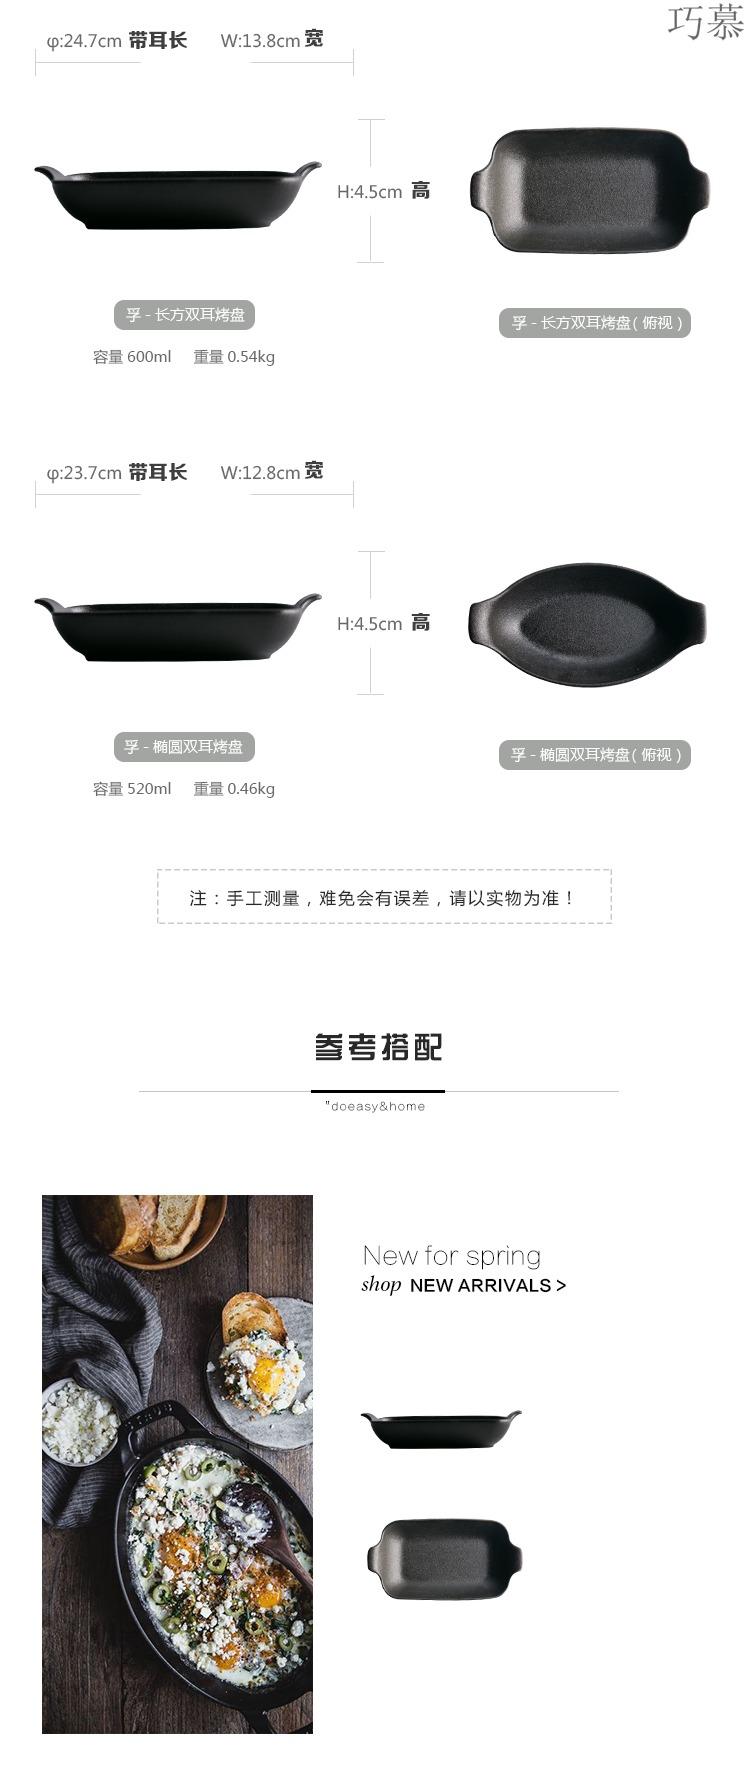 Qiao mu DY Nordic ears pan creative ceramic plate oval tableware dinner plate sushi plate flat shallow dish of fish